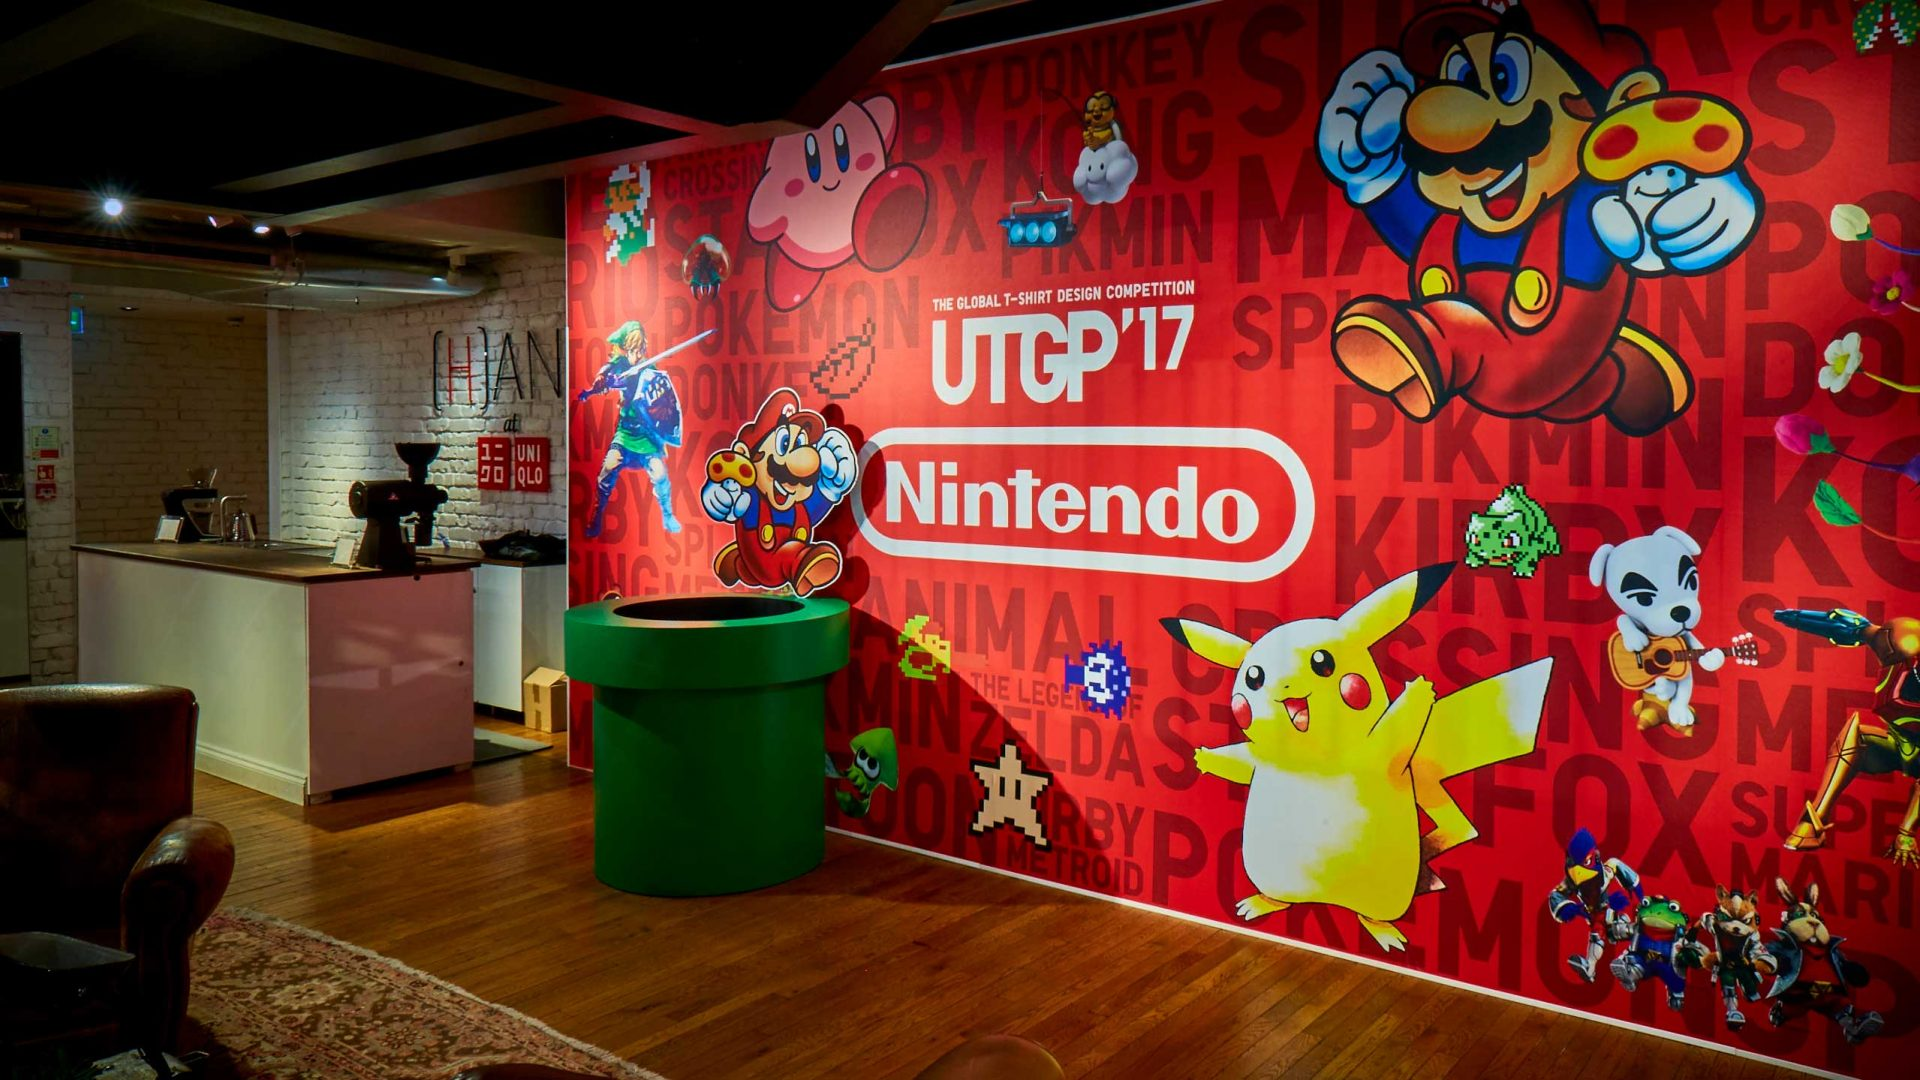 Nintendo display for UTGP17 at Uniqlo